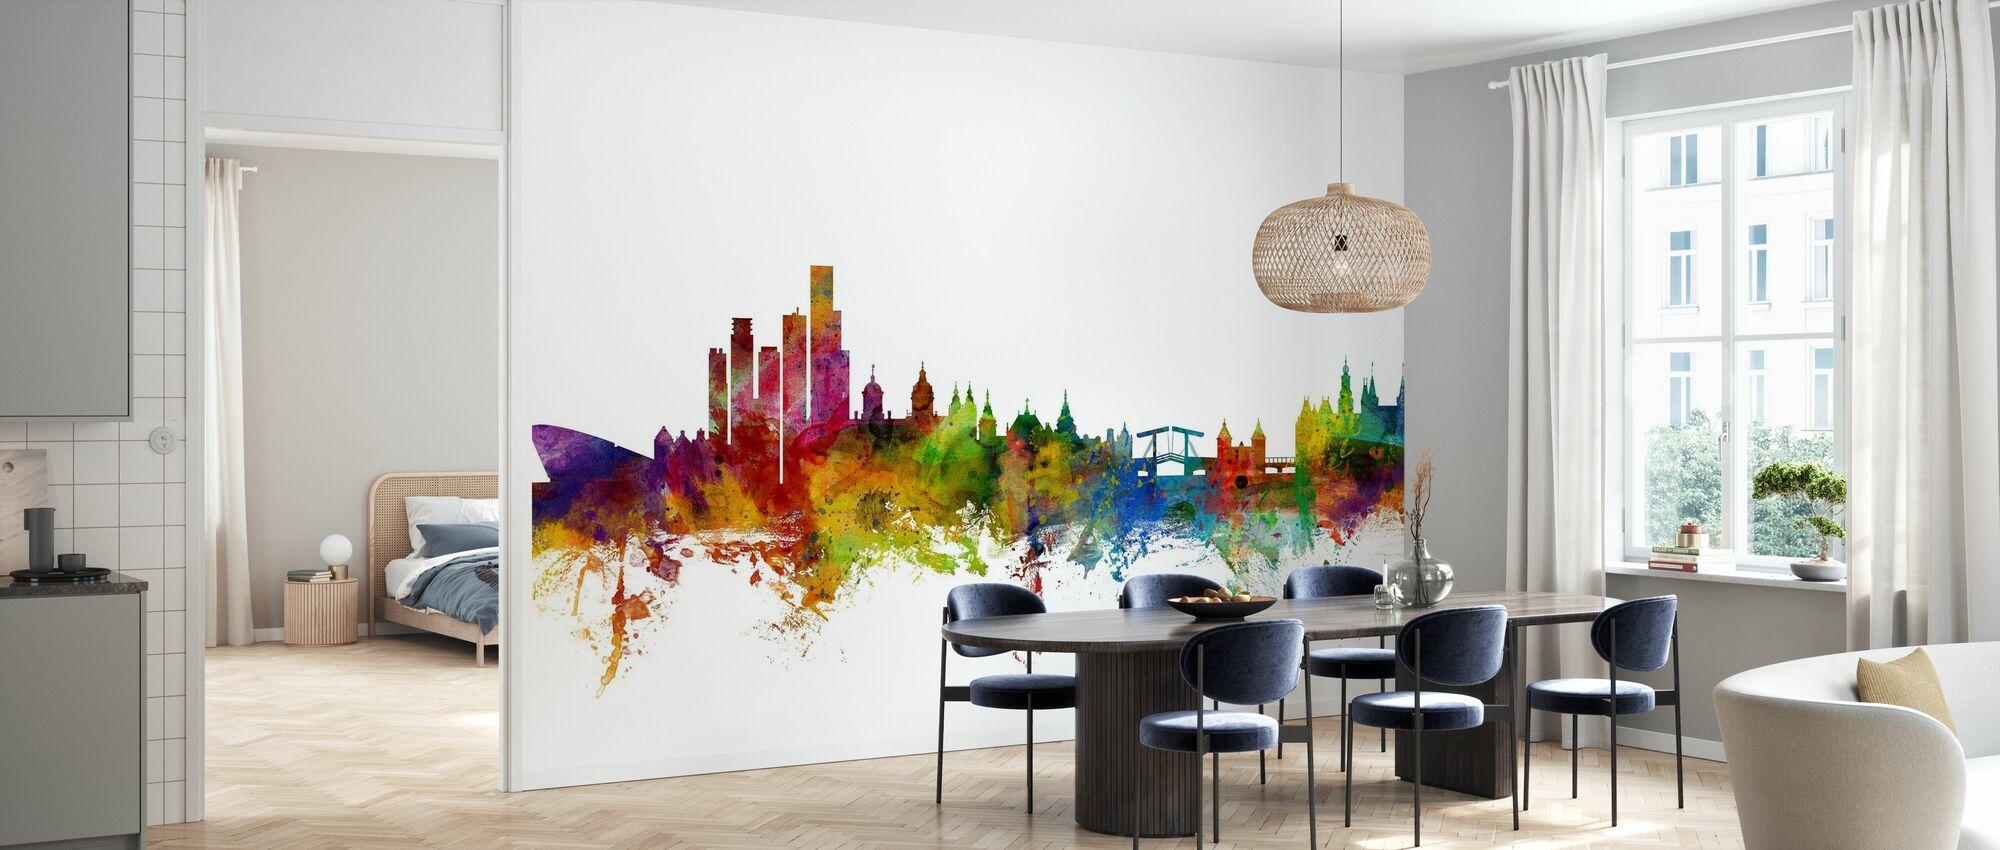 Amsterdam Skyline - Papel pintado - Cocina